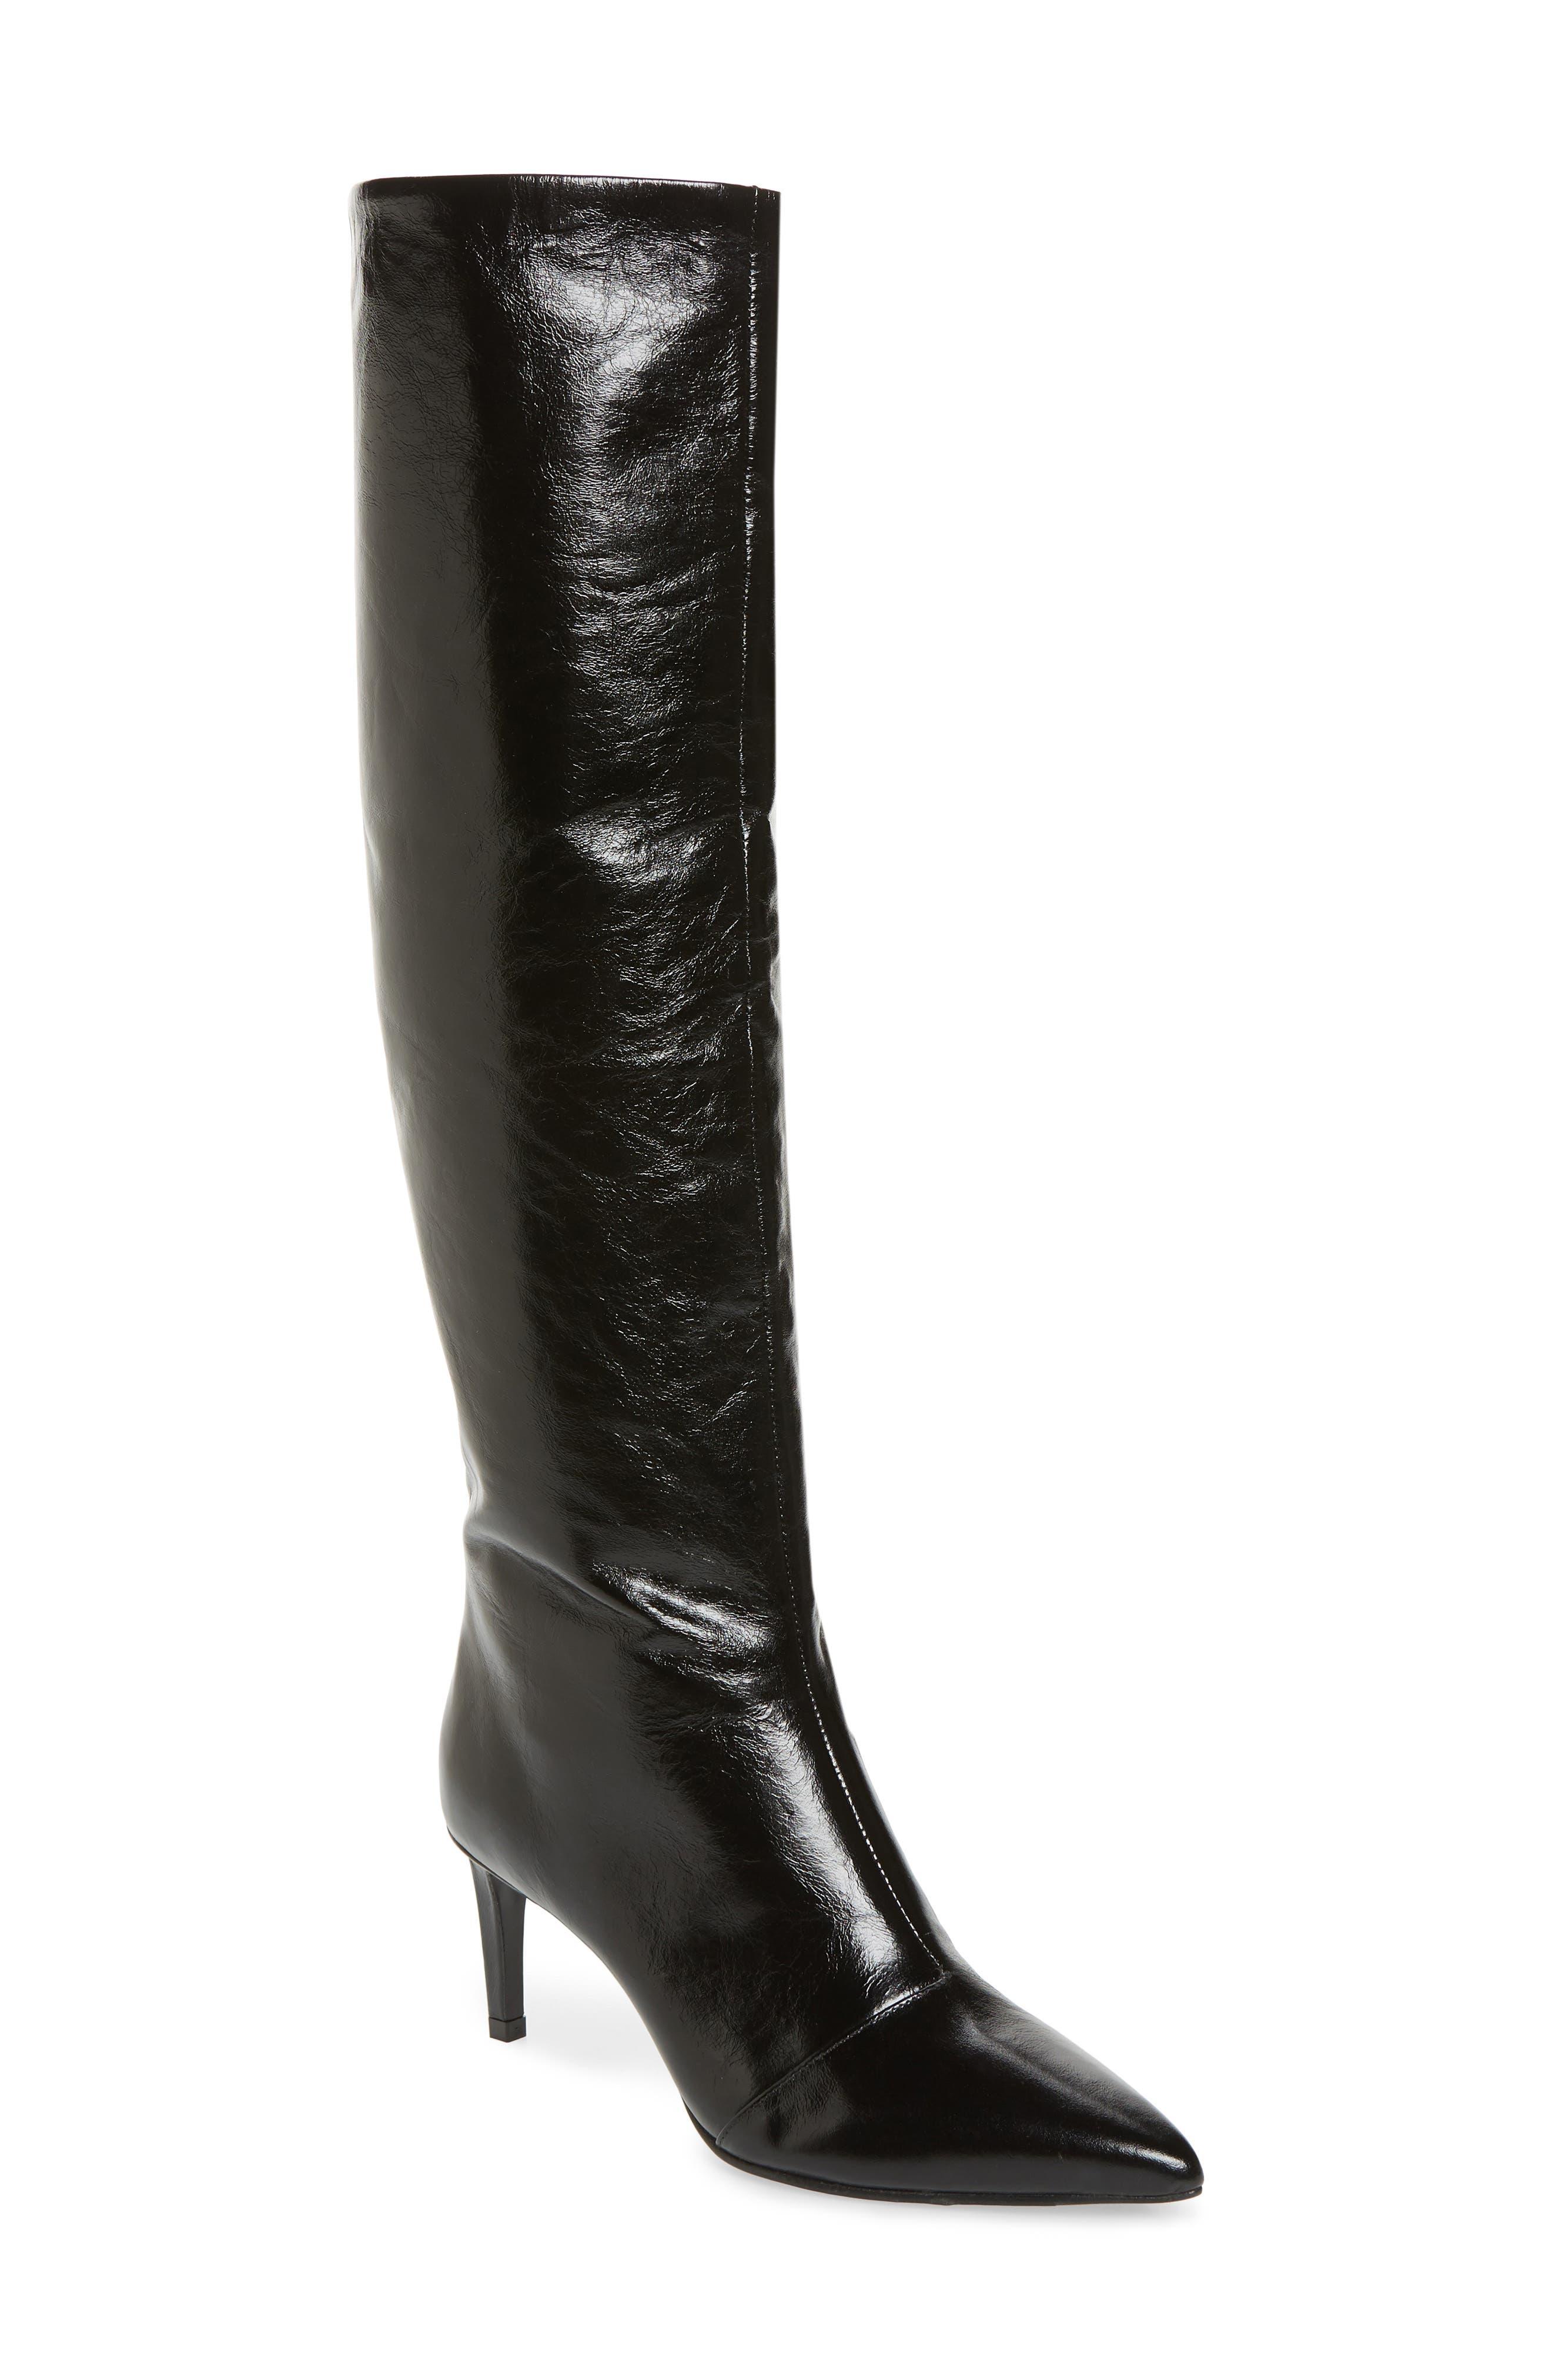 Rag & Bone Beha Knee High Boot, Black